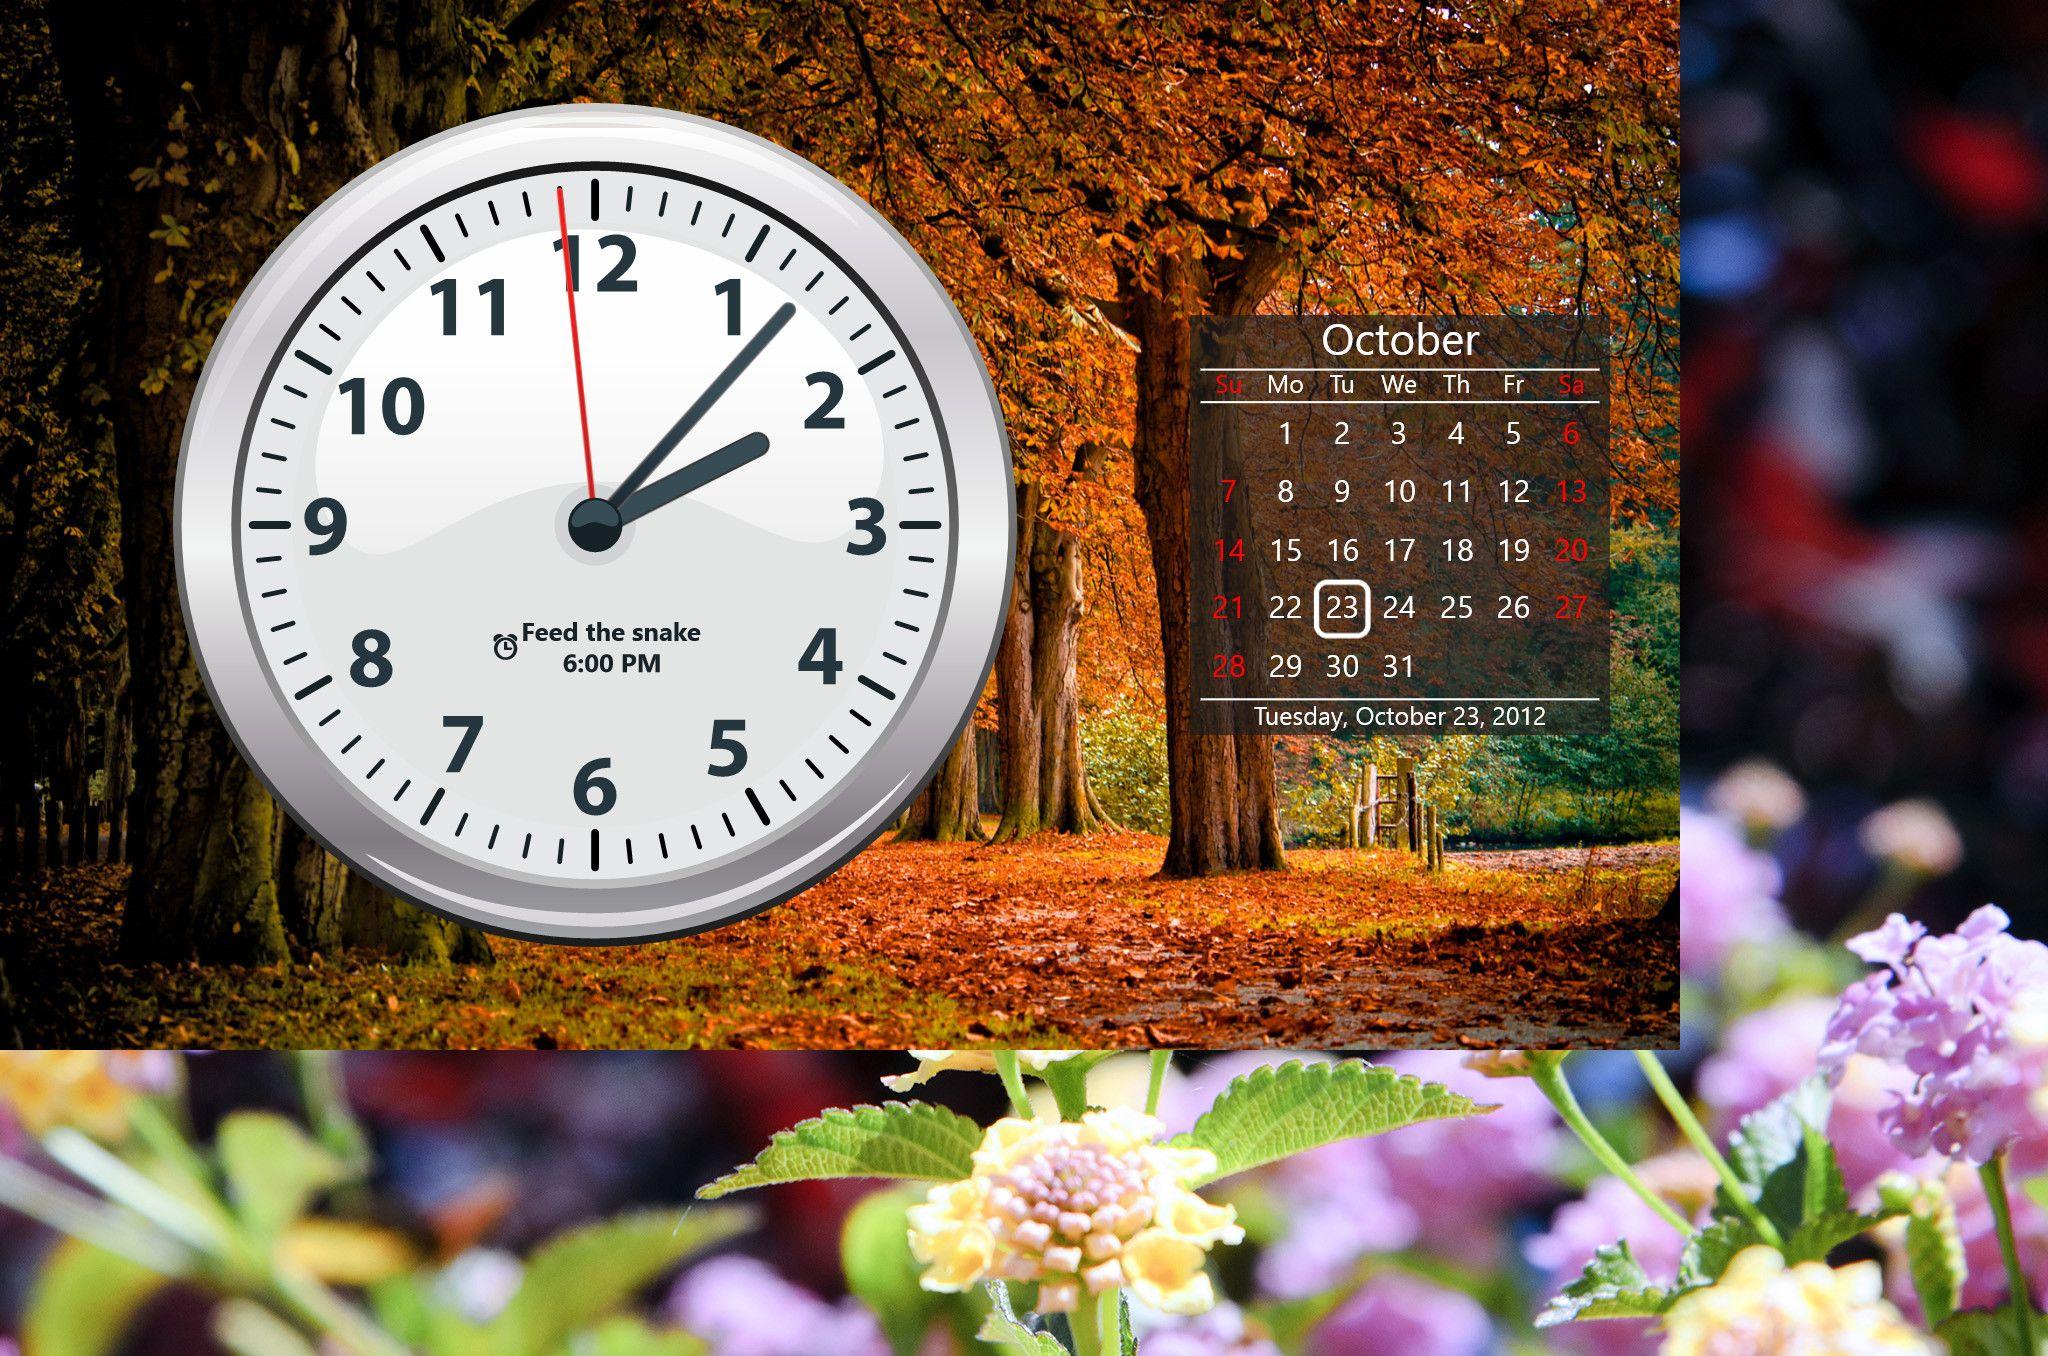 Clock Live Wallpaper Windows 10 57 Images Live Wallpapers Wallpaper Windows 10 Beautiful Girl Wallpaper